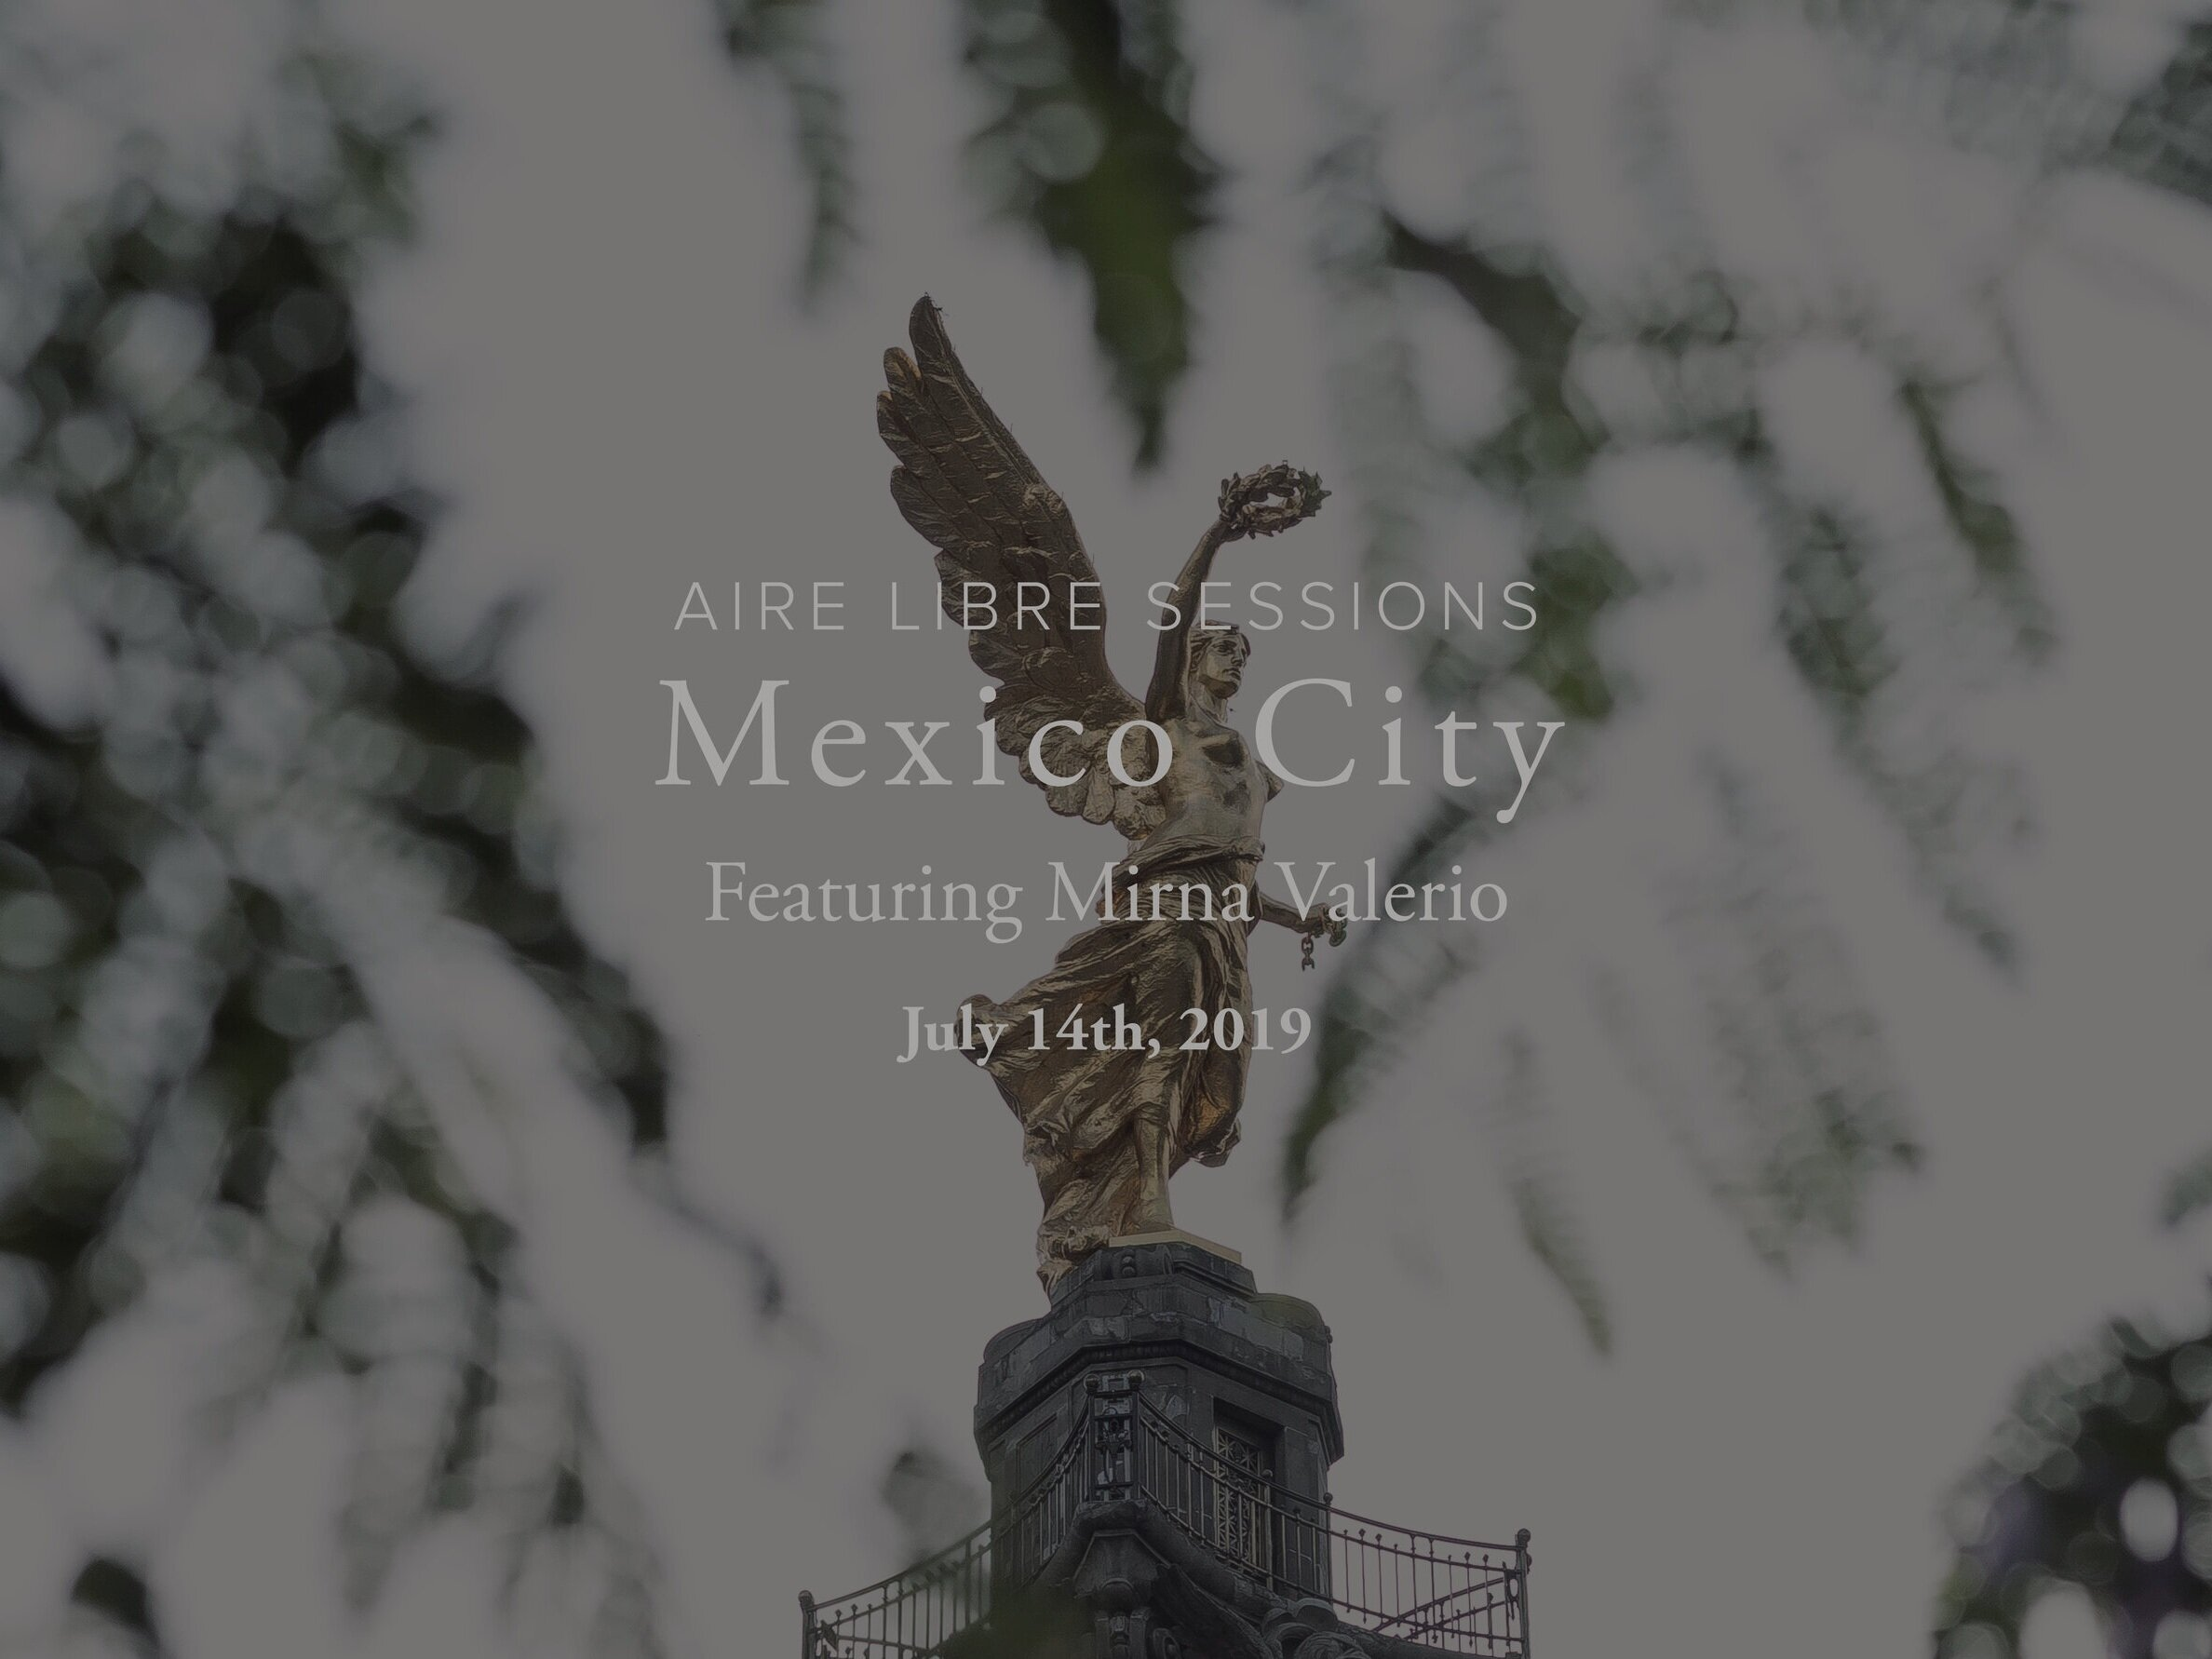 Aire Libre Sessions: Mexico City (Mirna Valerio) - October 9th, 2019